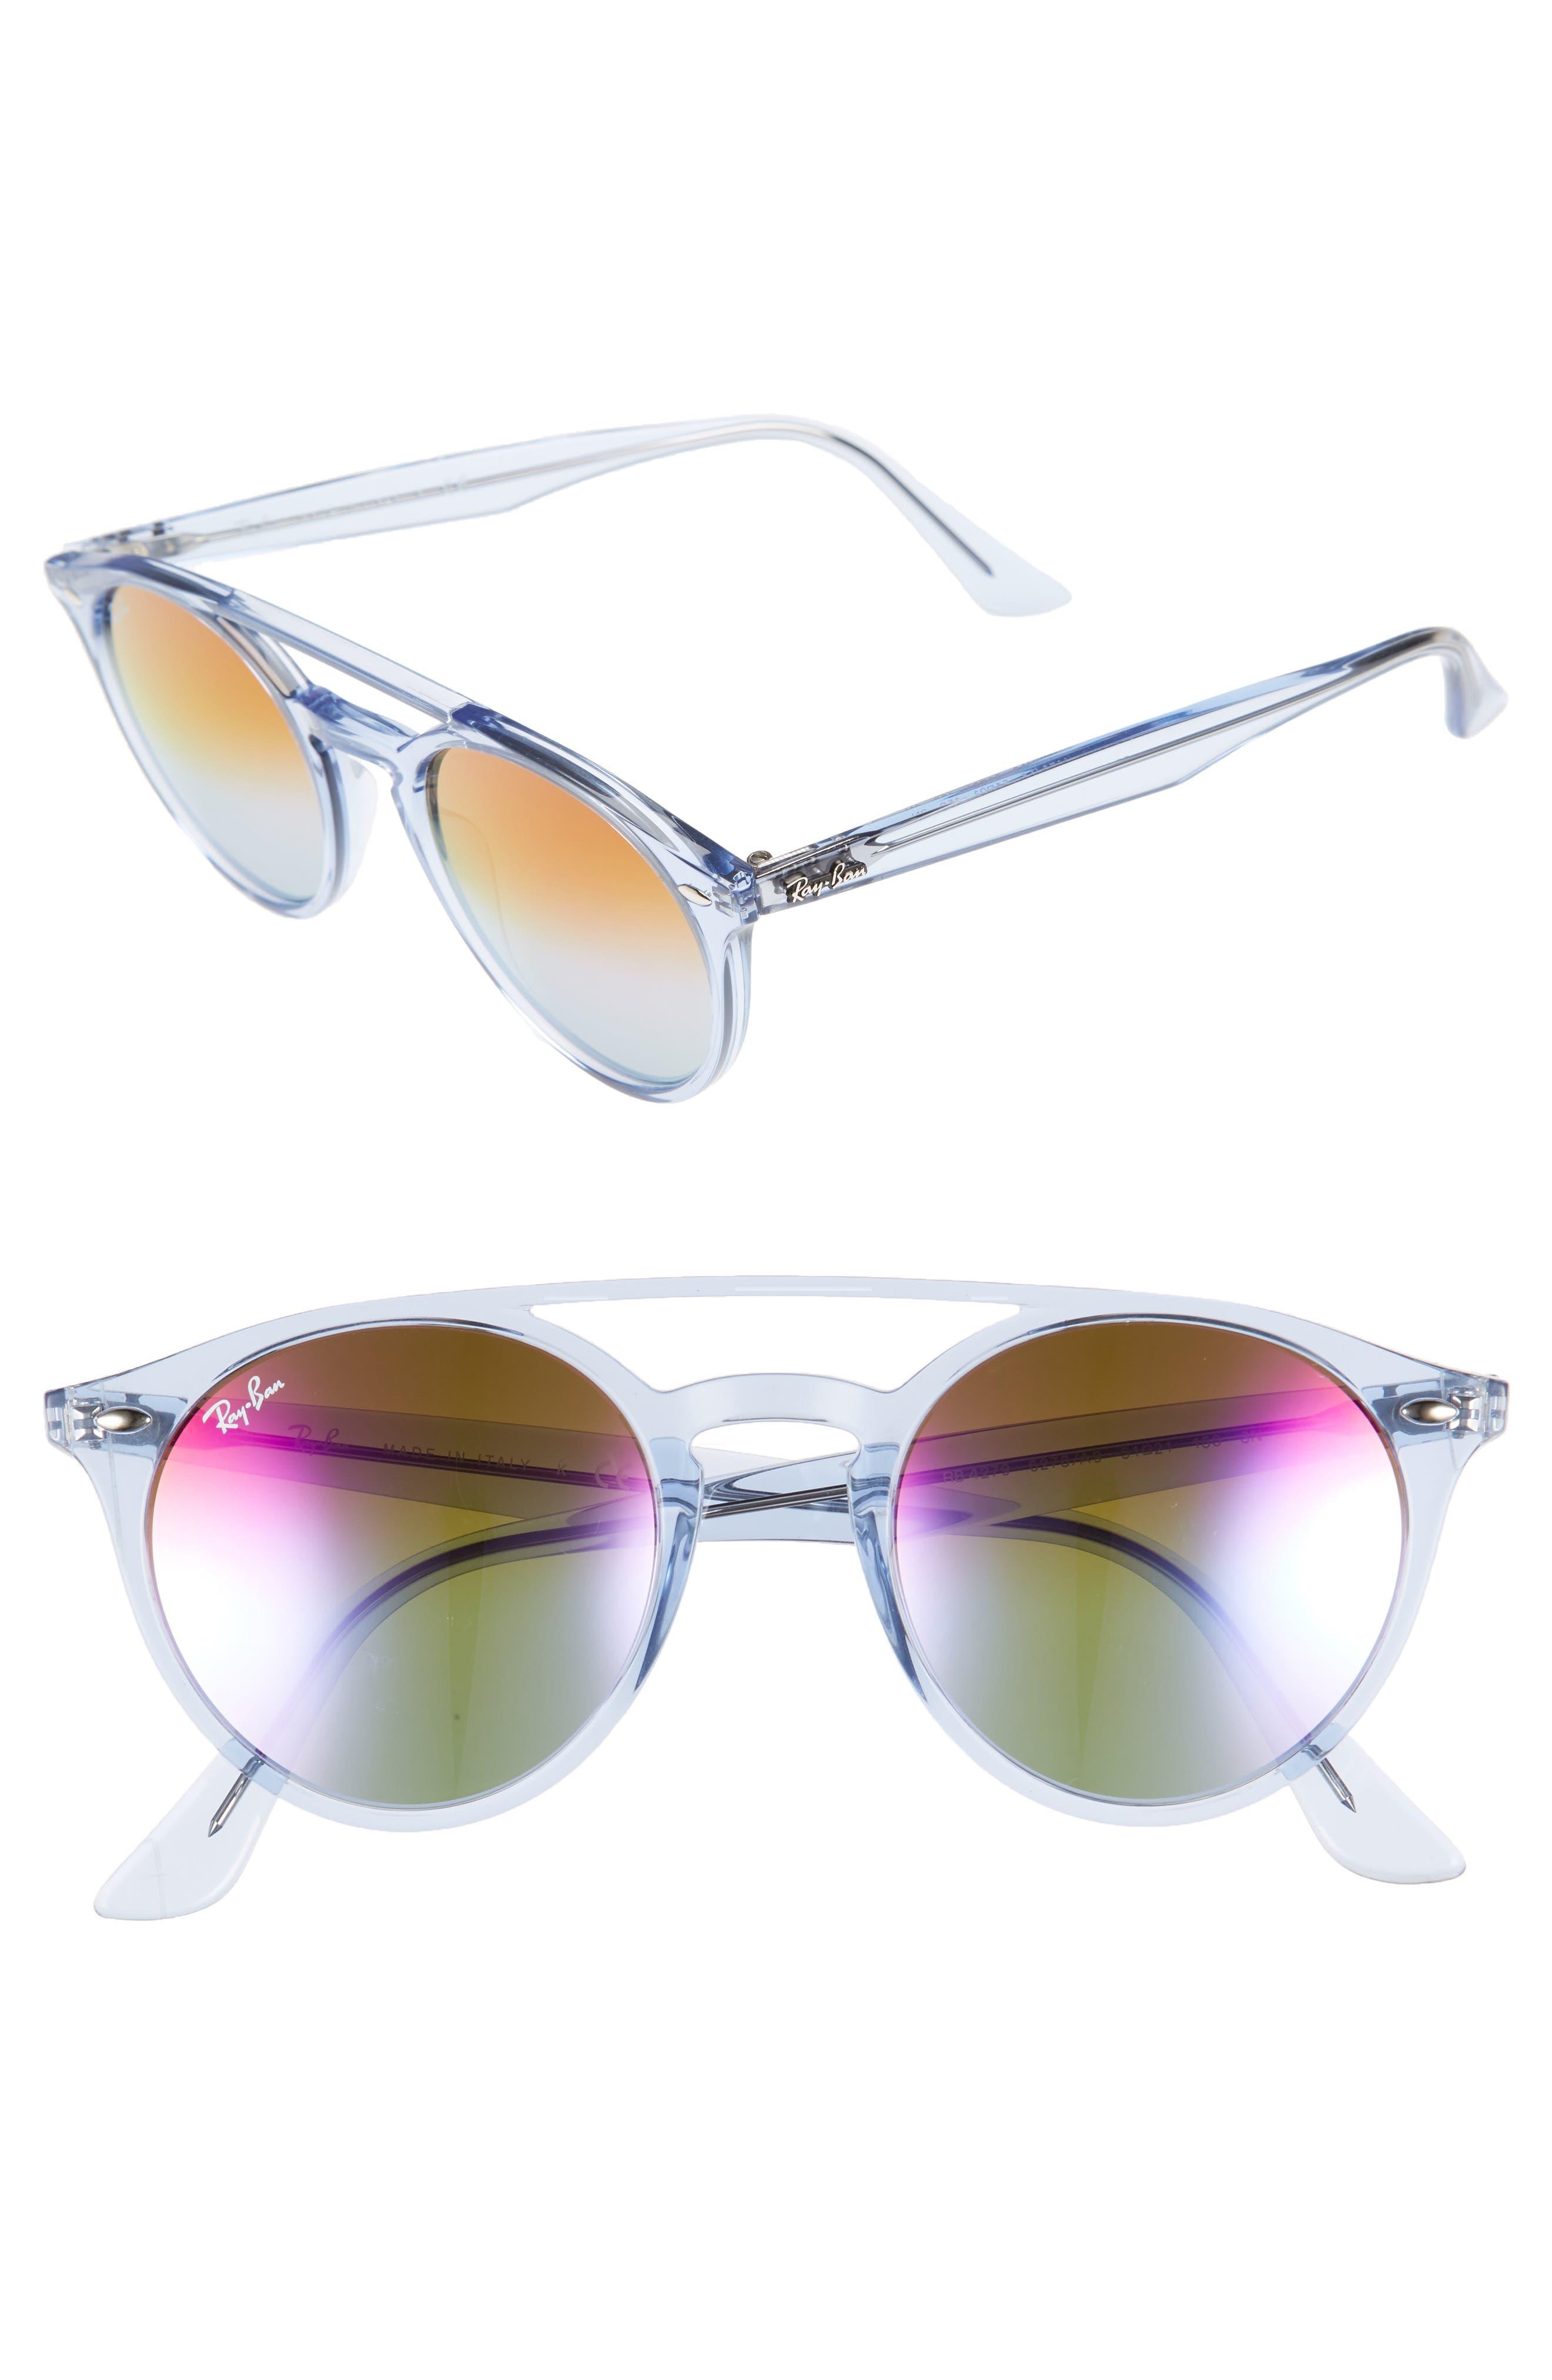 51mm Mirrored Rainbow Sunglasses,                             Alternate thumbnail 2, color,                             428